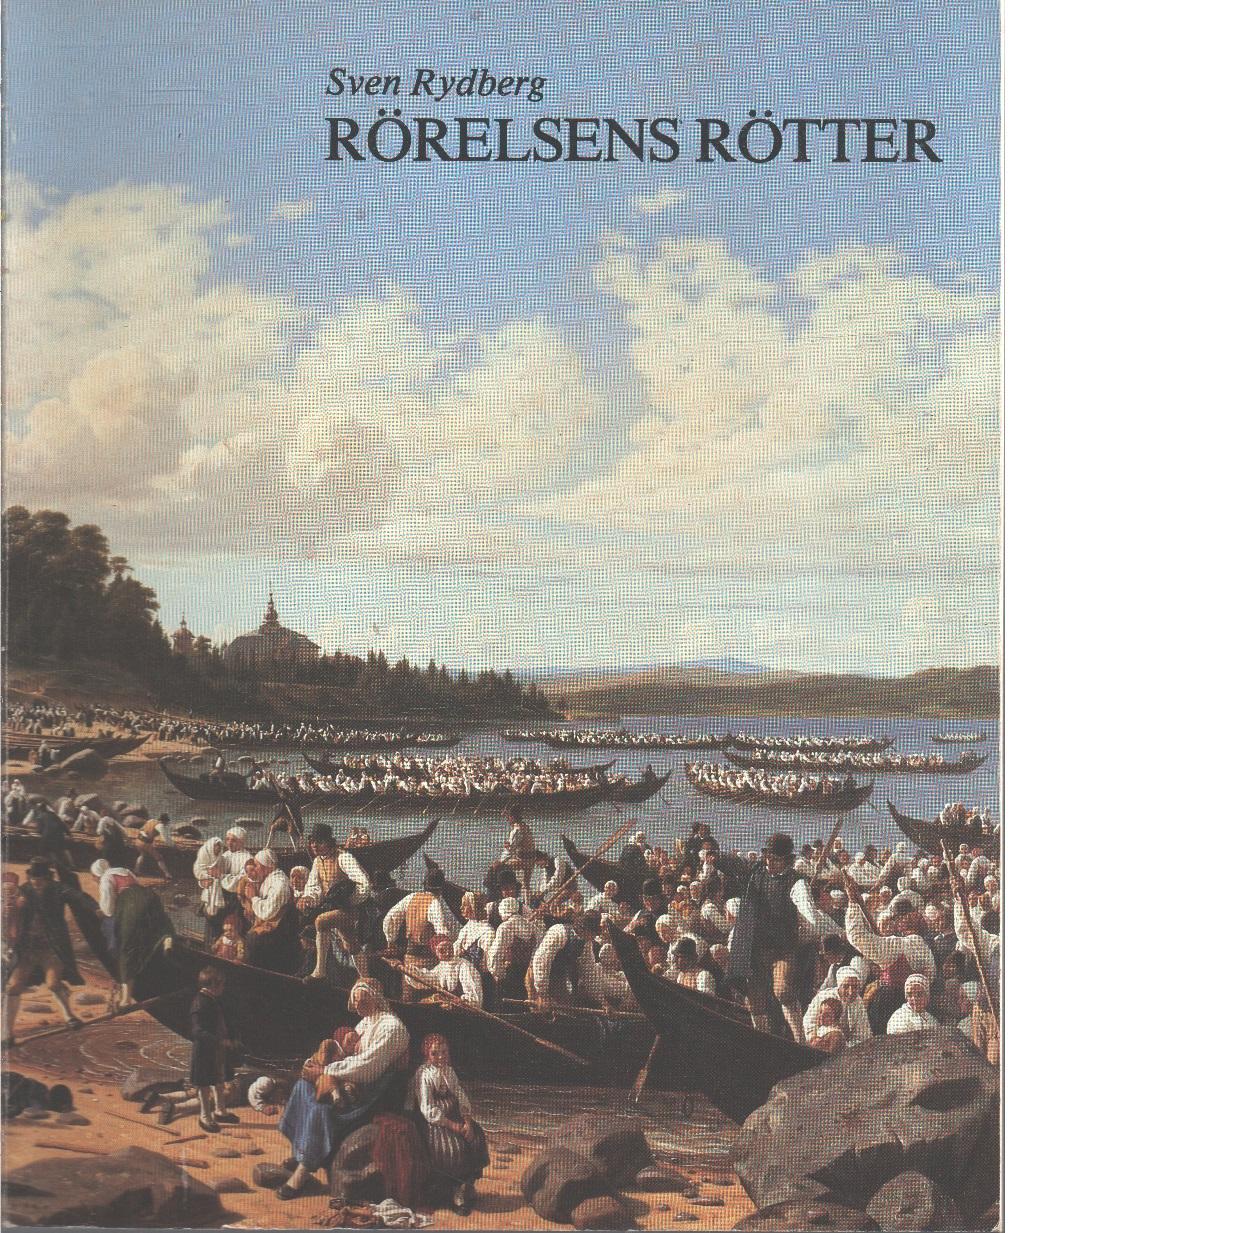 Rörelsens rötter - Rydberg, Sven